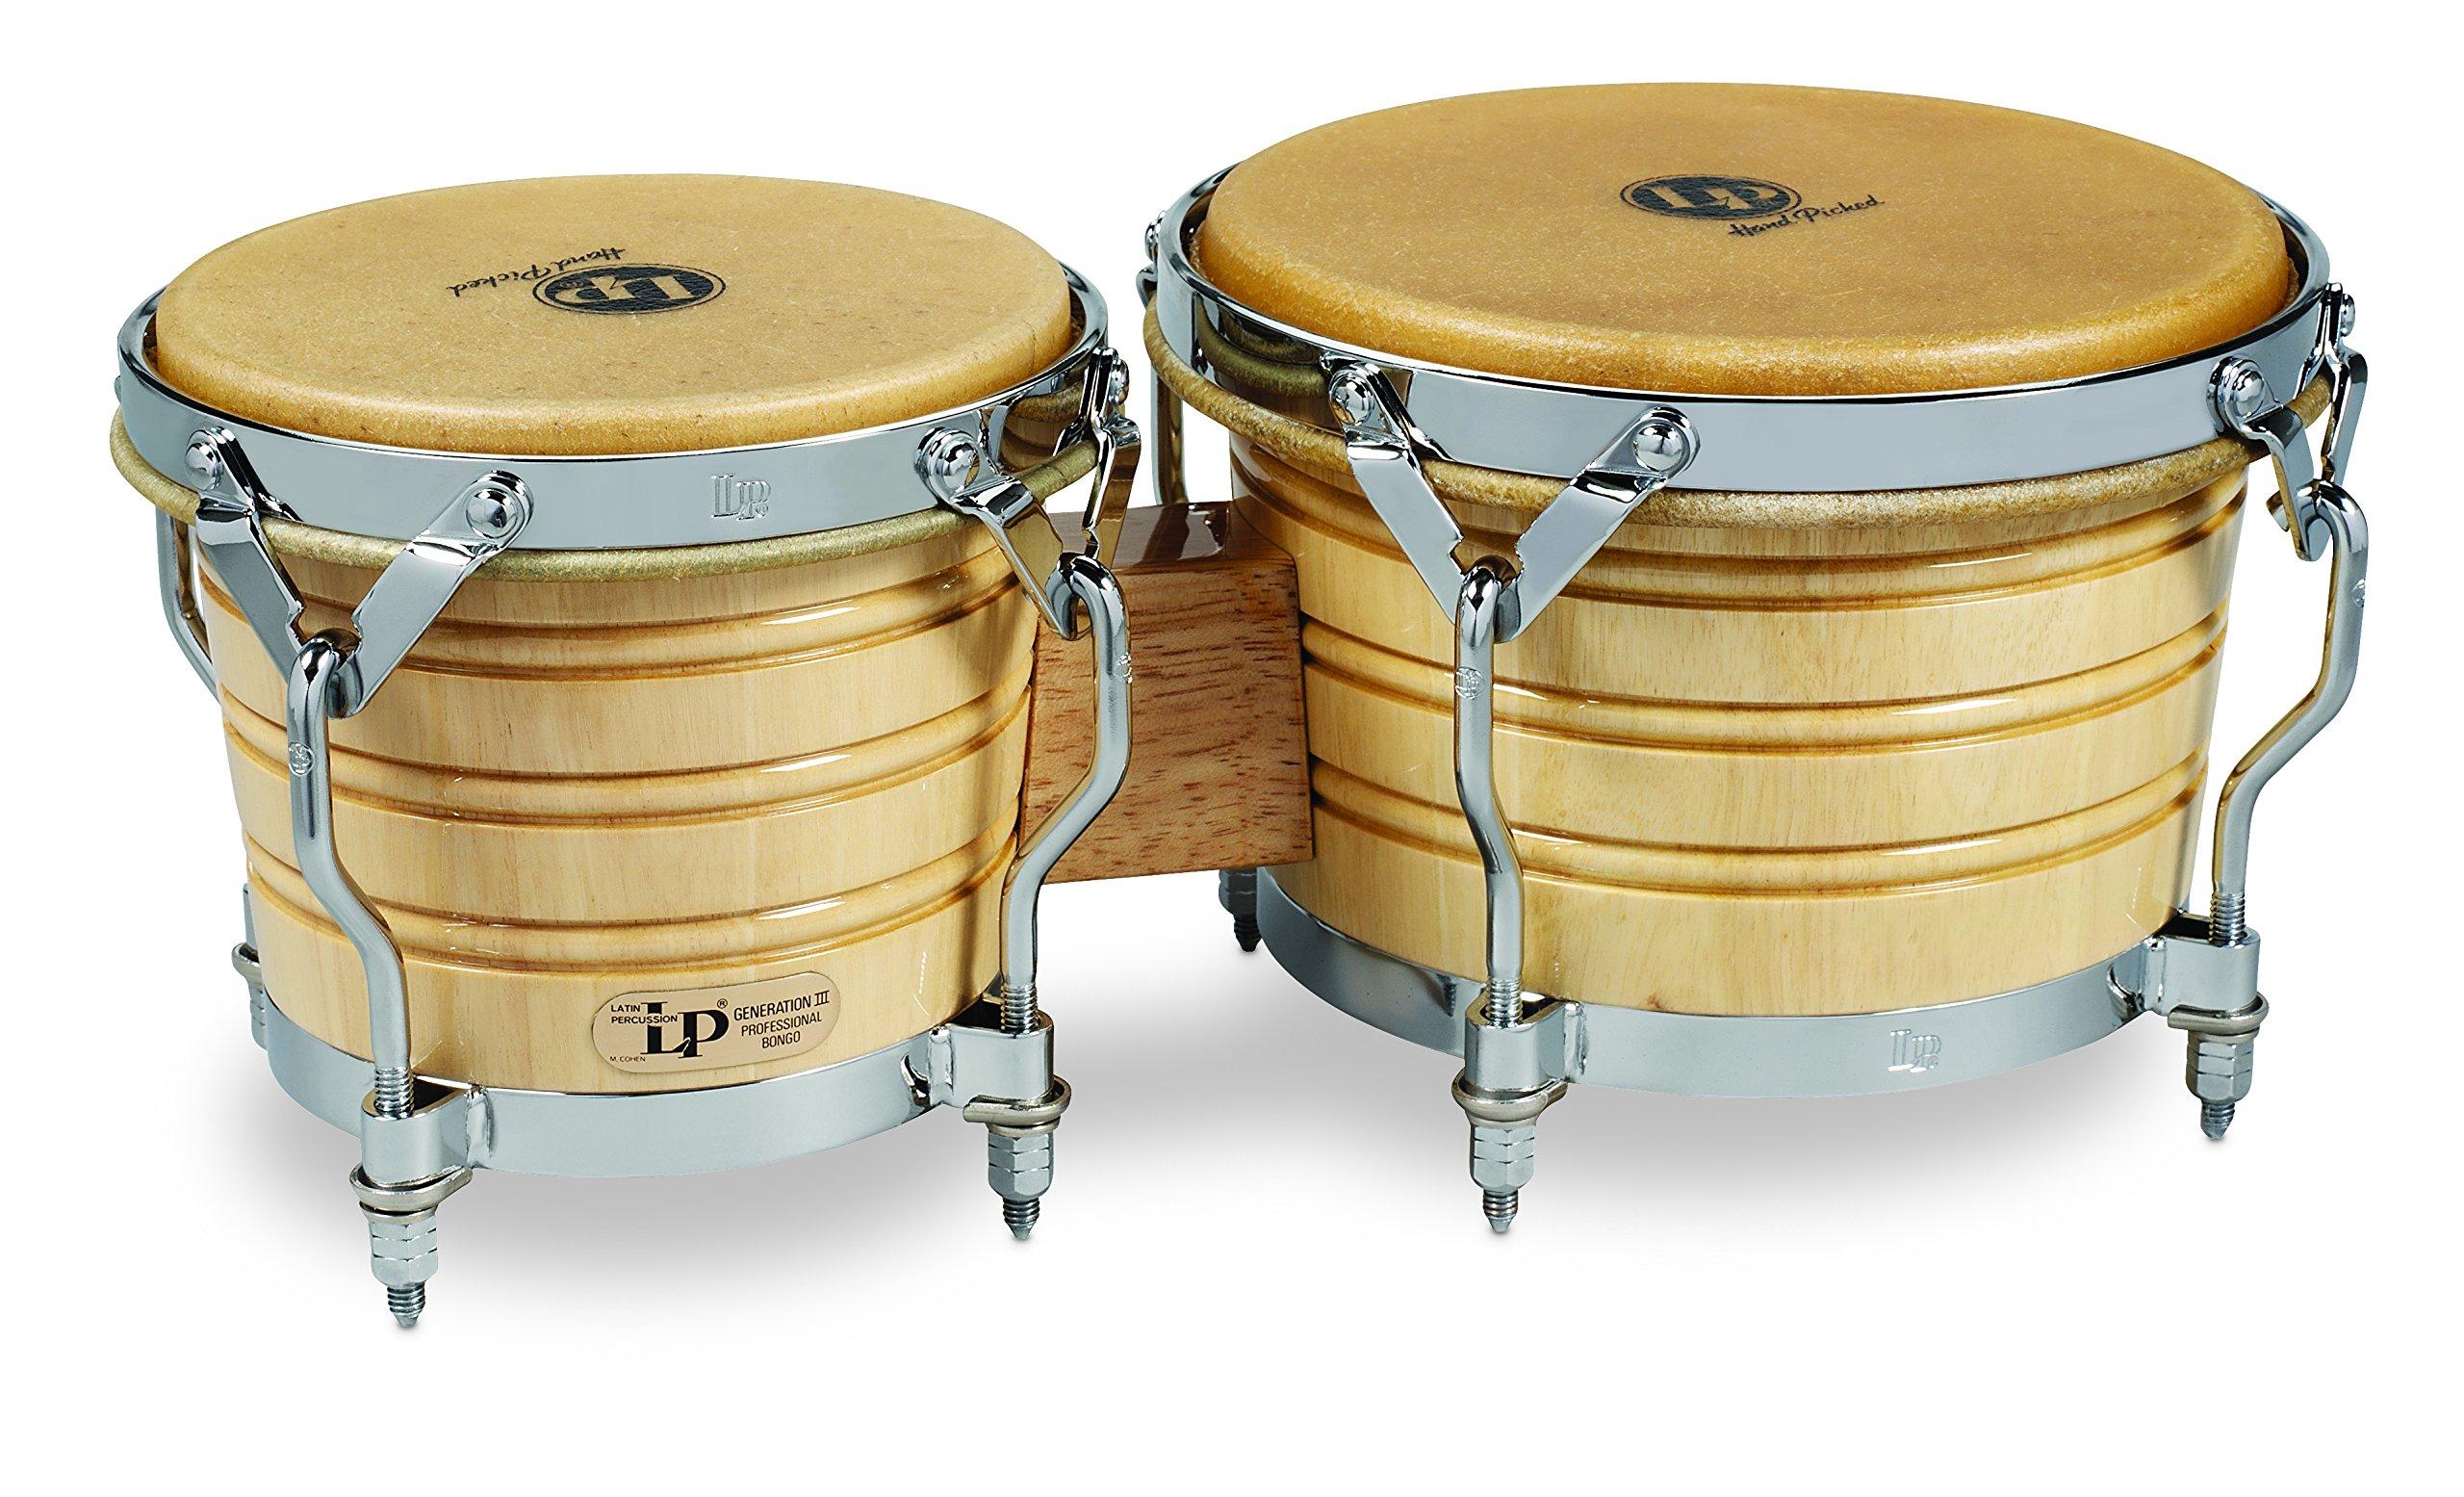 Latin Percussion LP201A-3 Bongo Drum, Natural/Chrome